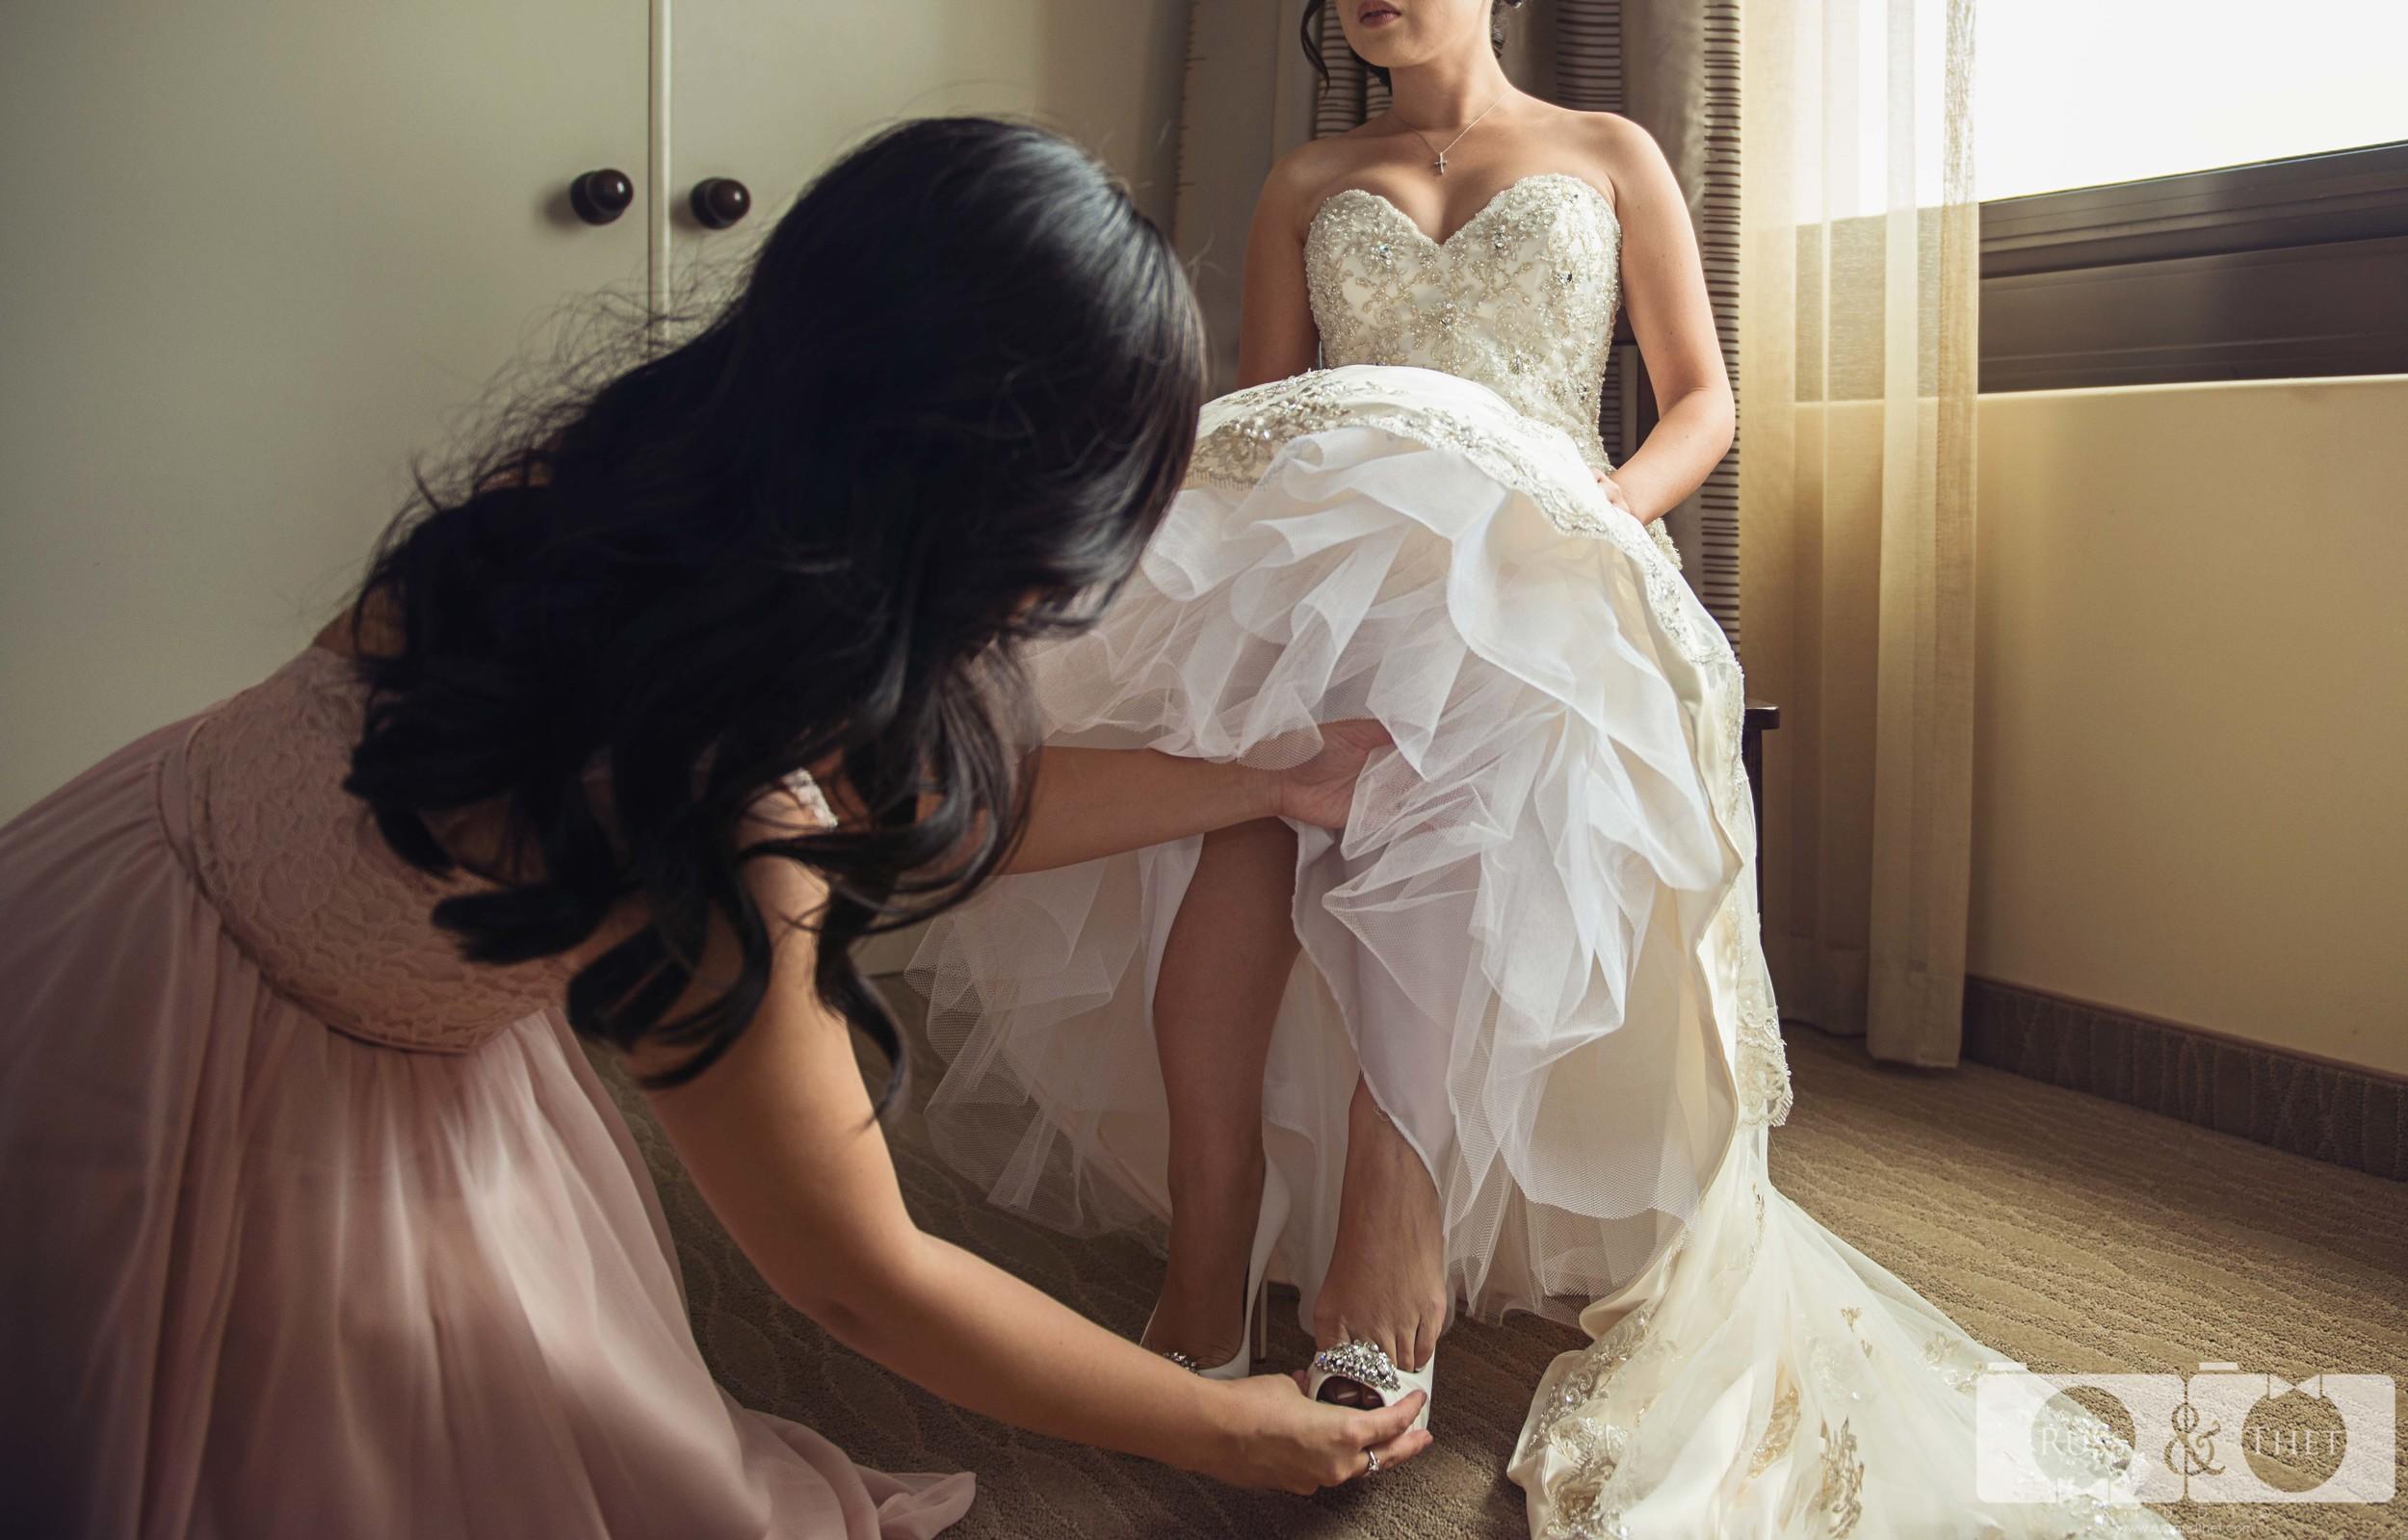 summit-house-fullerton-wedding-photographer-38.JPG